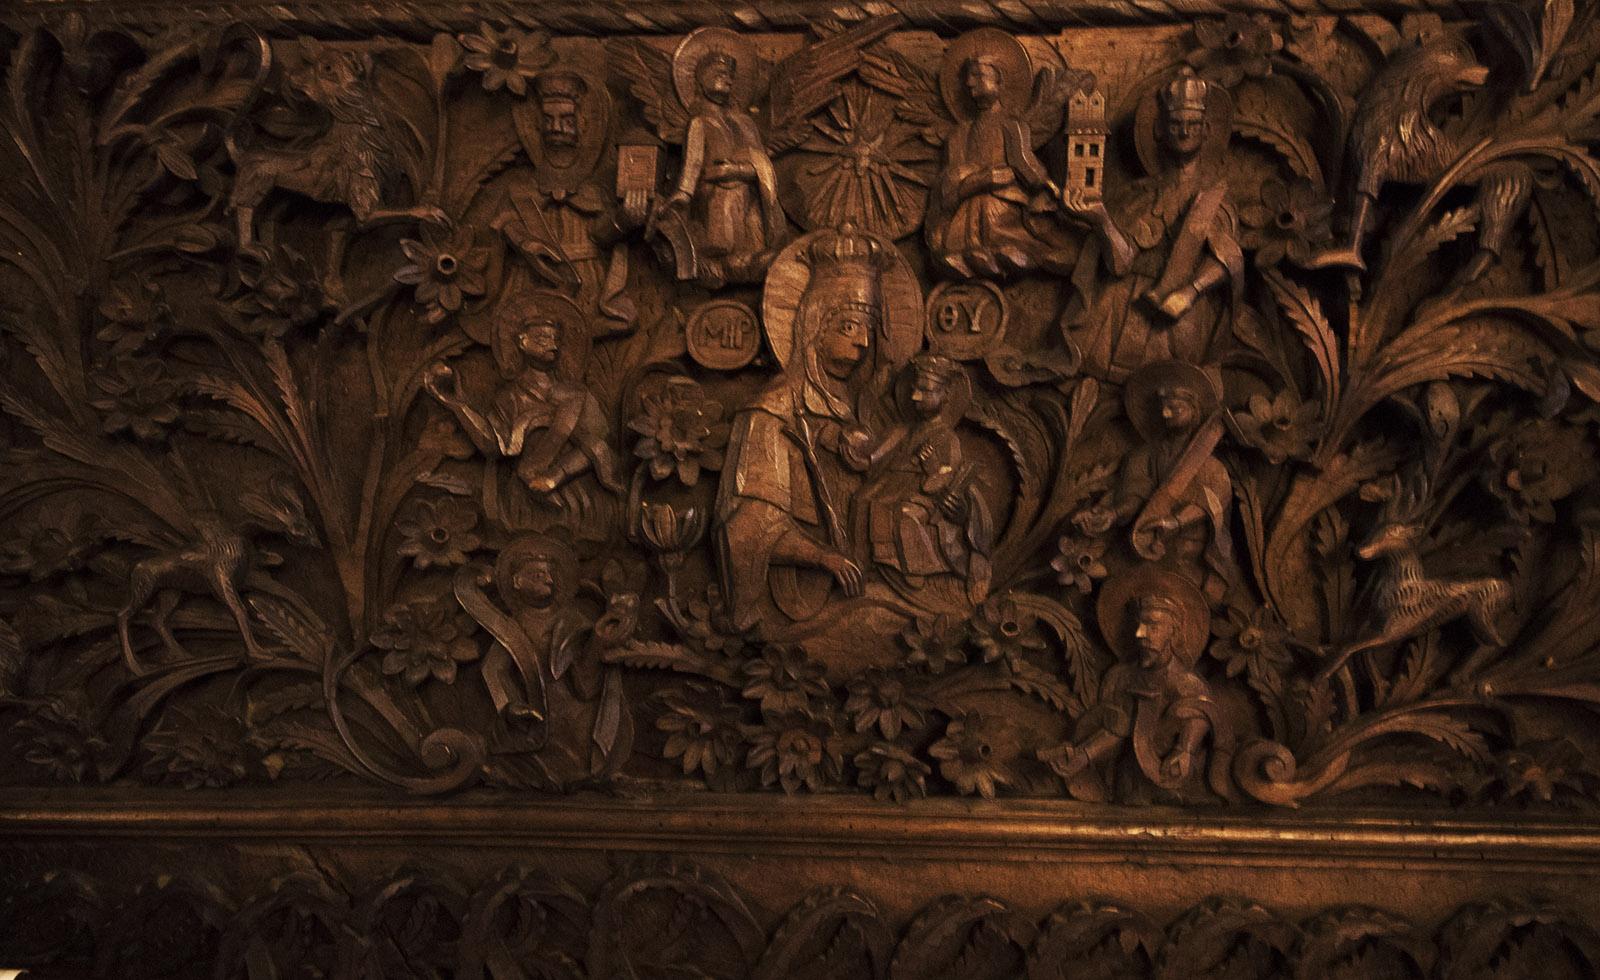 Orthphoto Detajl Ot Ikonostasa V Crkvata Sv Bogorodica Gr